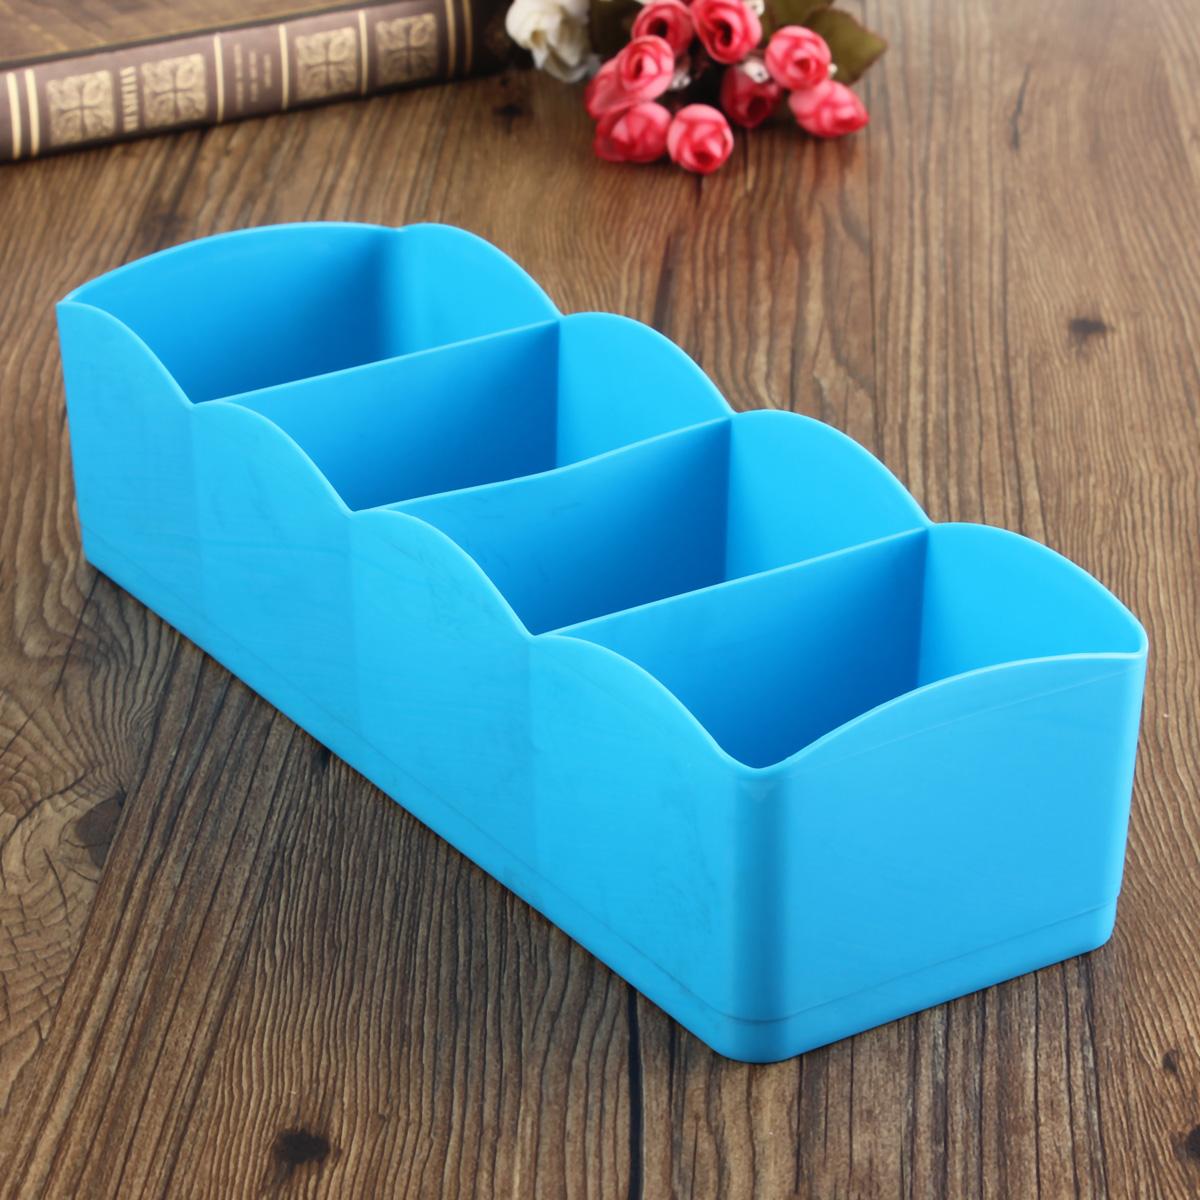 Boite separateur de tiroir rangement pr chaussette sous - Rangement chaussettes tiroir ...